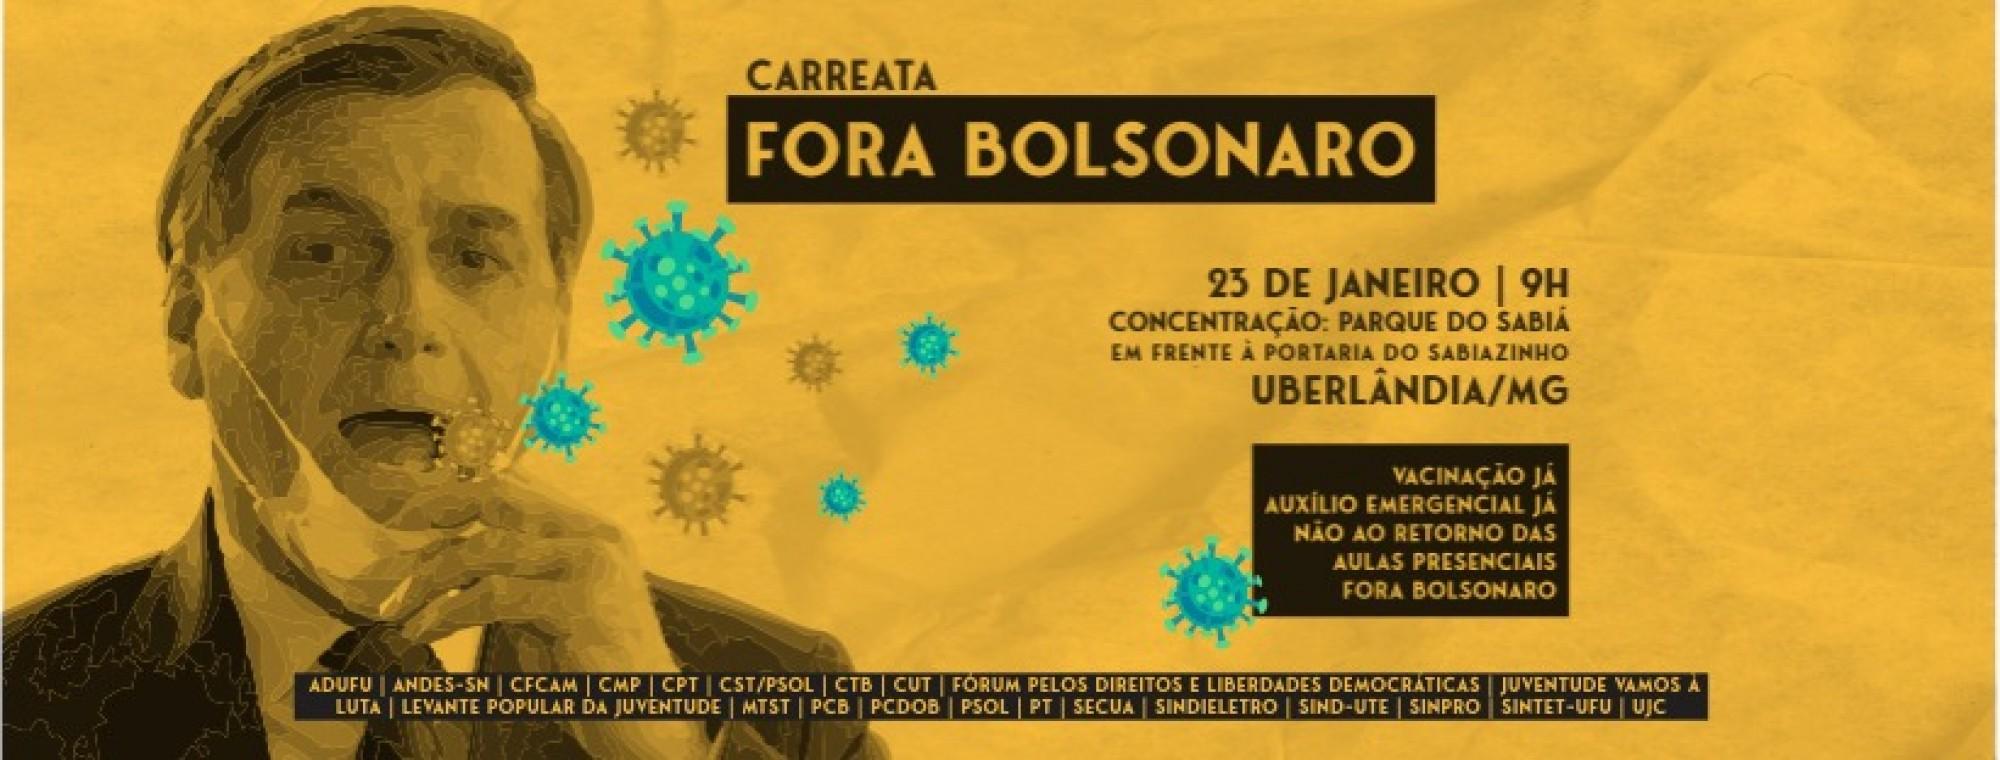 Carreata Fora Bolsonaro em Uberlândia